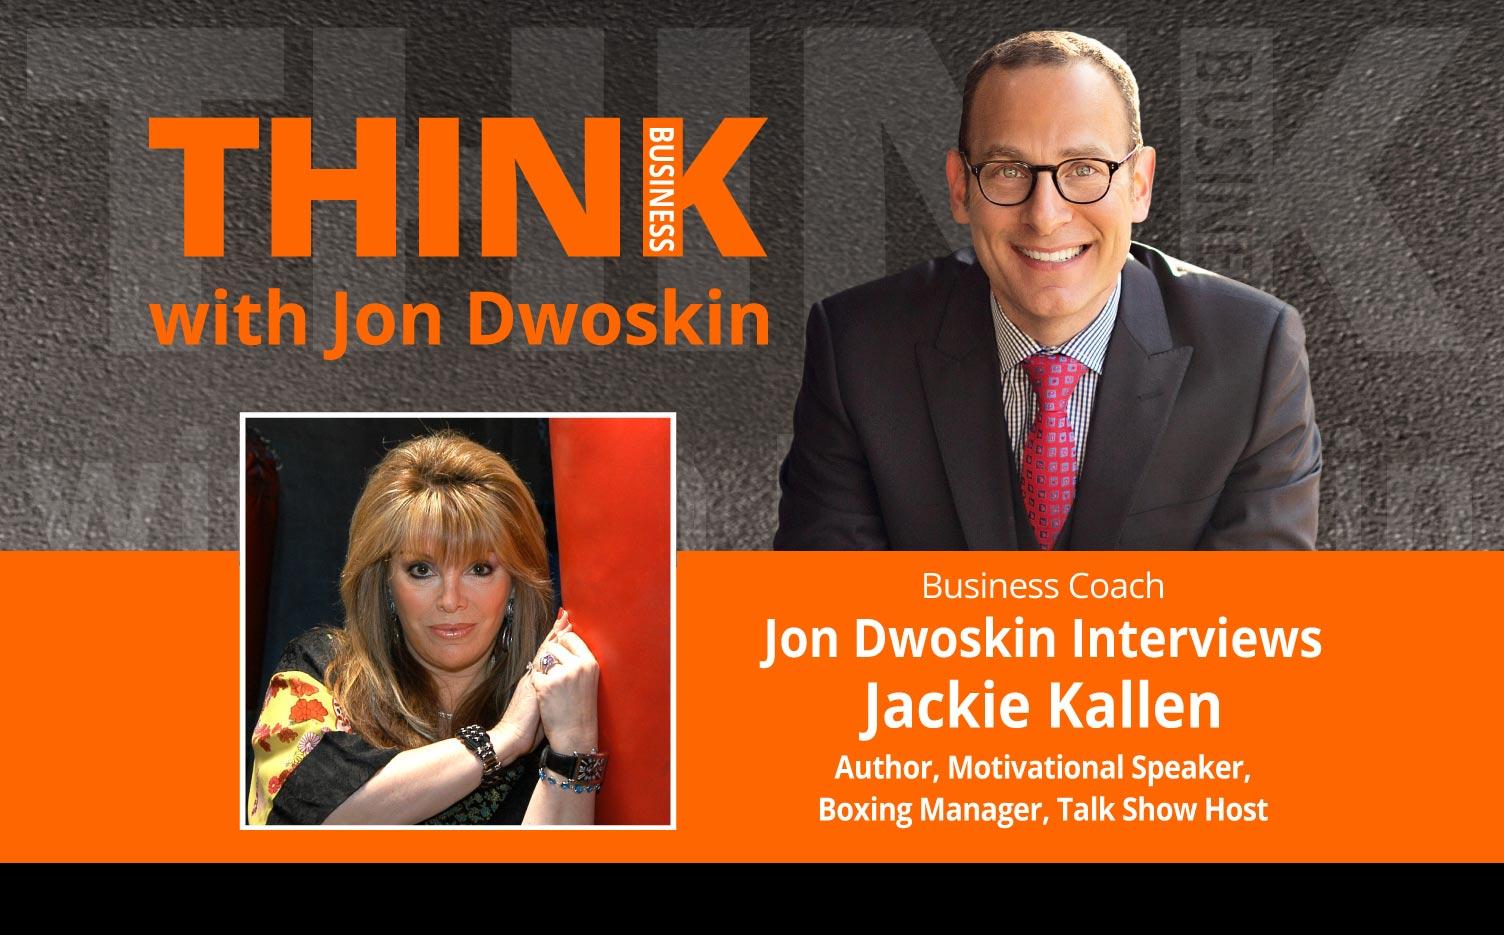 THINK Business Podcast:Jon Dwoskin Interviews Jackie Kallen, Author, Motivational Speaker, Boxing Manager, Talk Show Host